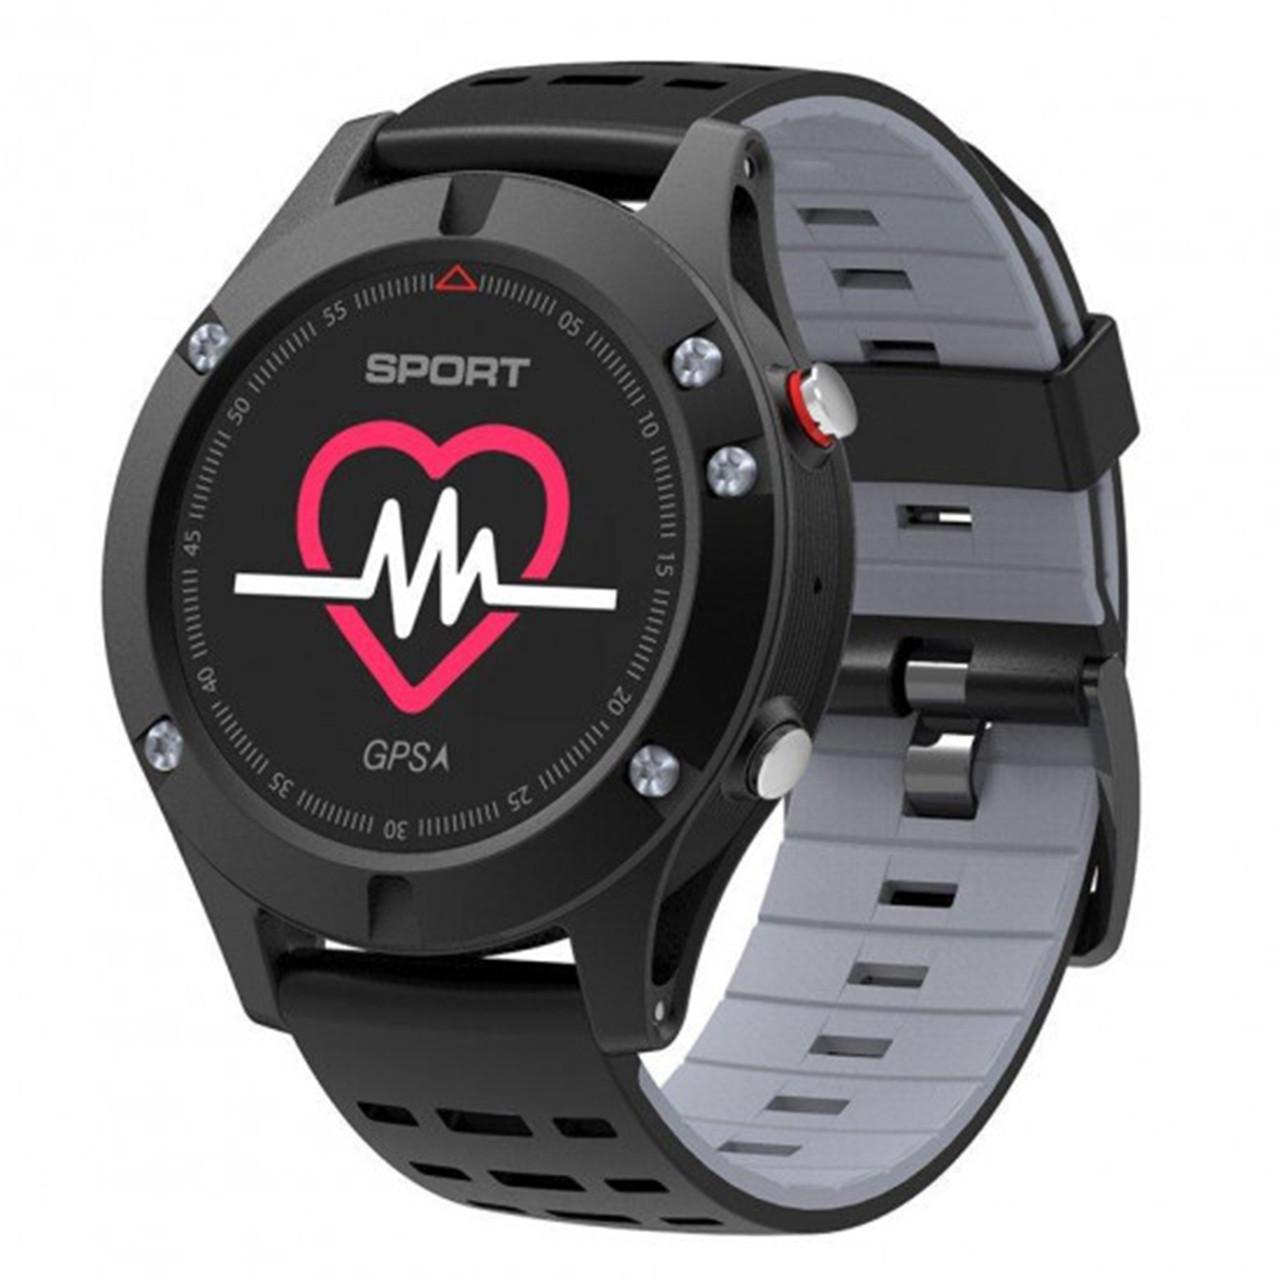 Мультиспортивные часы JETIX F5 с GPS трекером Black Grey (2704976)